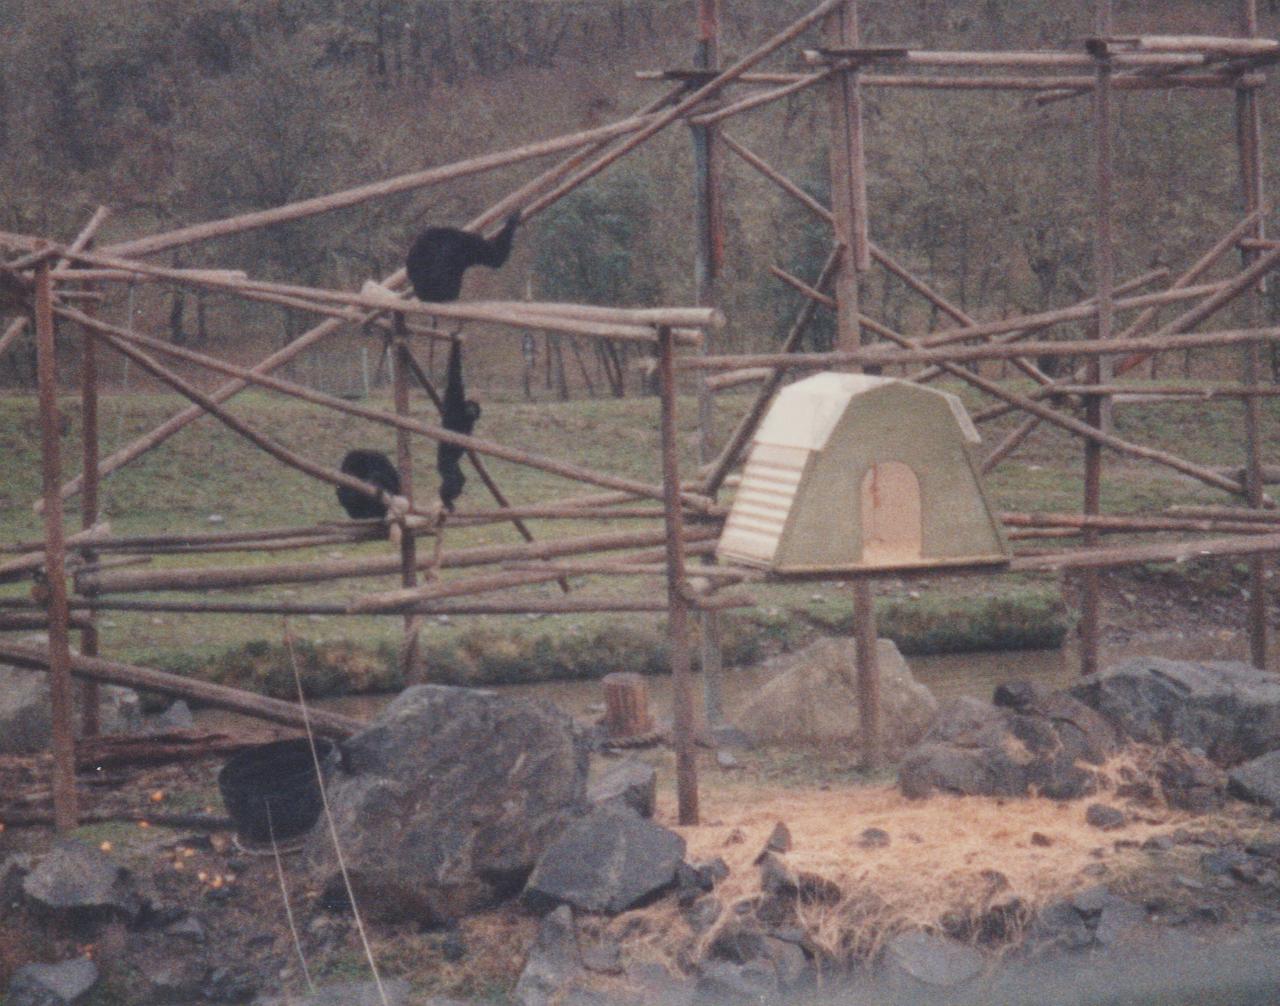 1992-12-26 - Saturday - Wildlife Safari Trip, Marilyn, Crystal-15.png